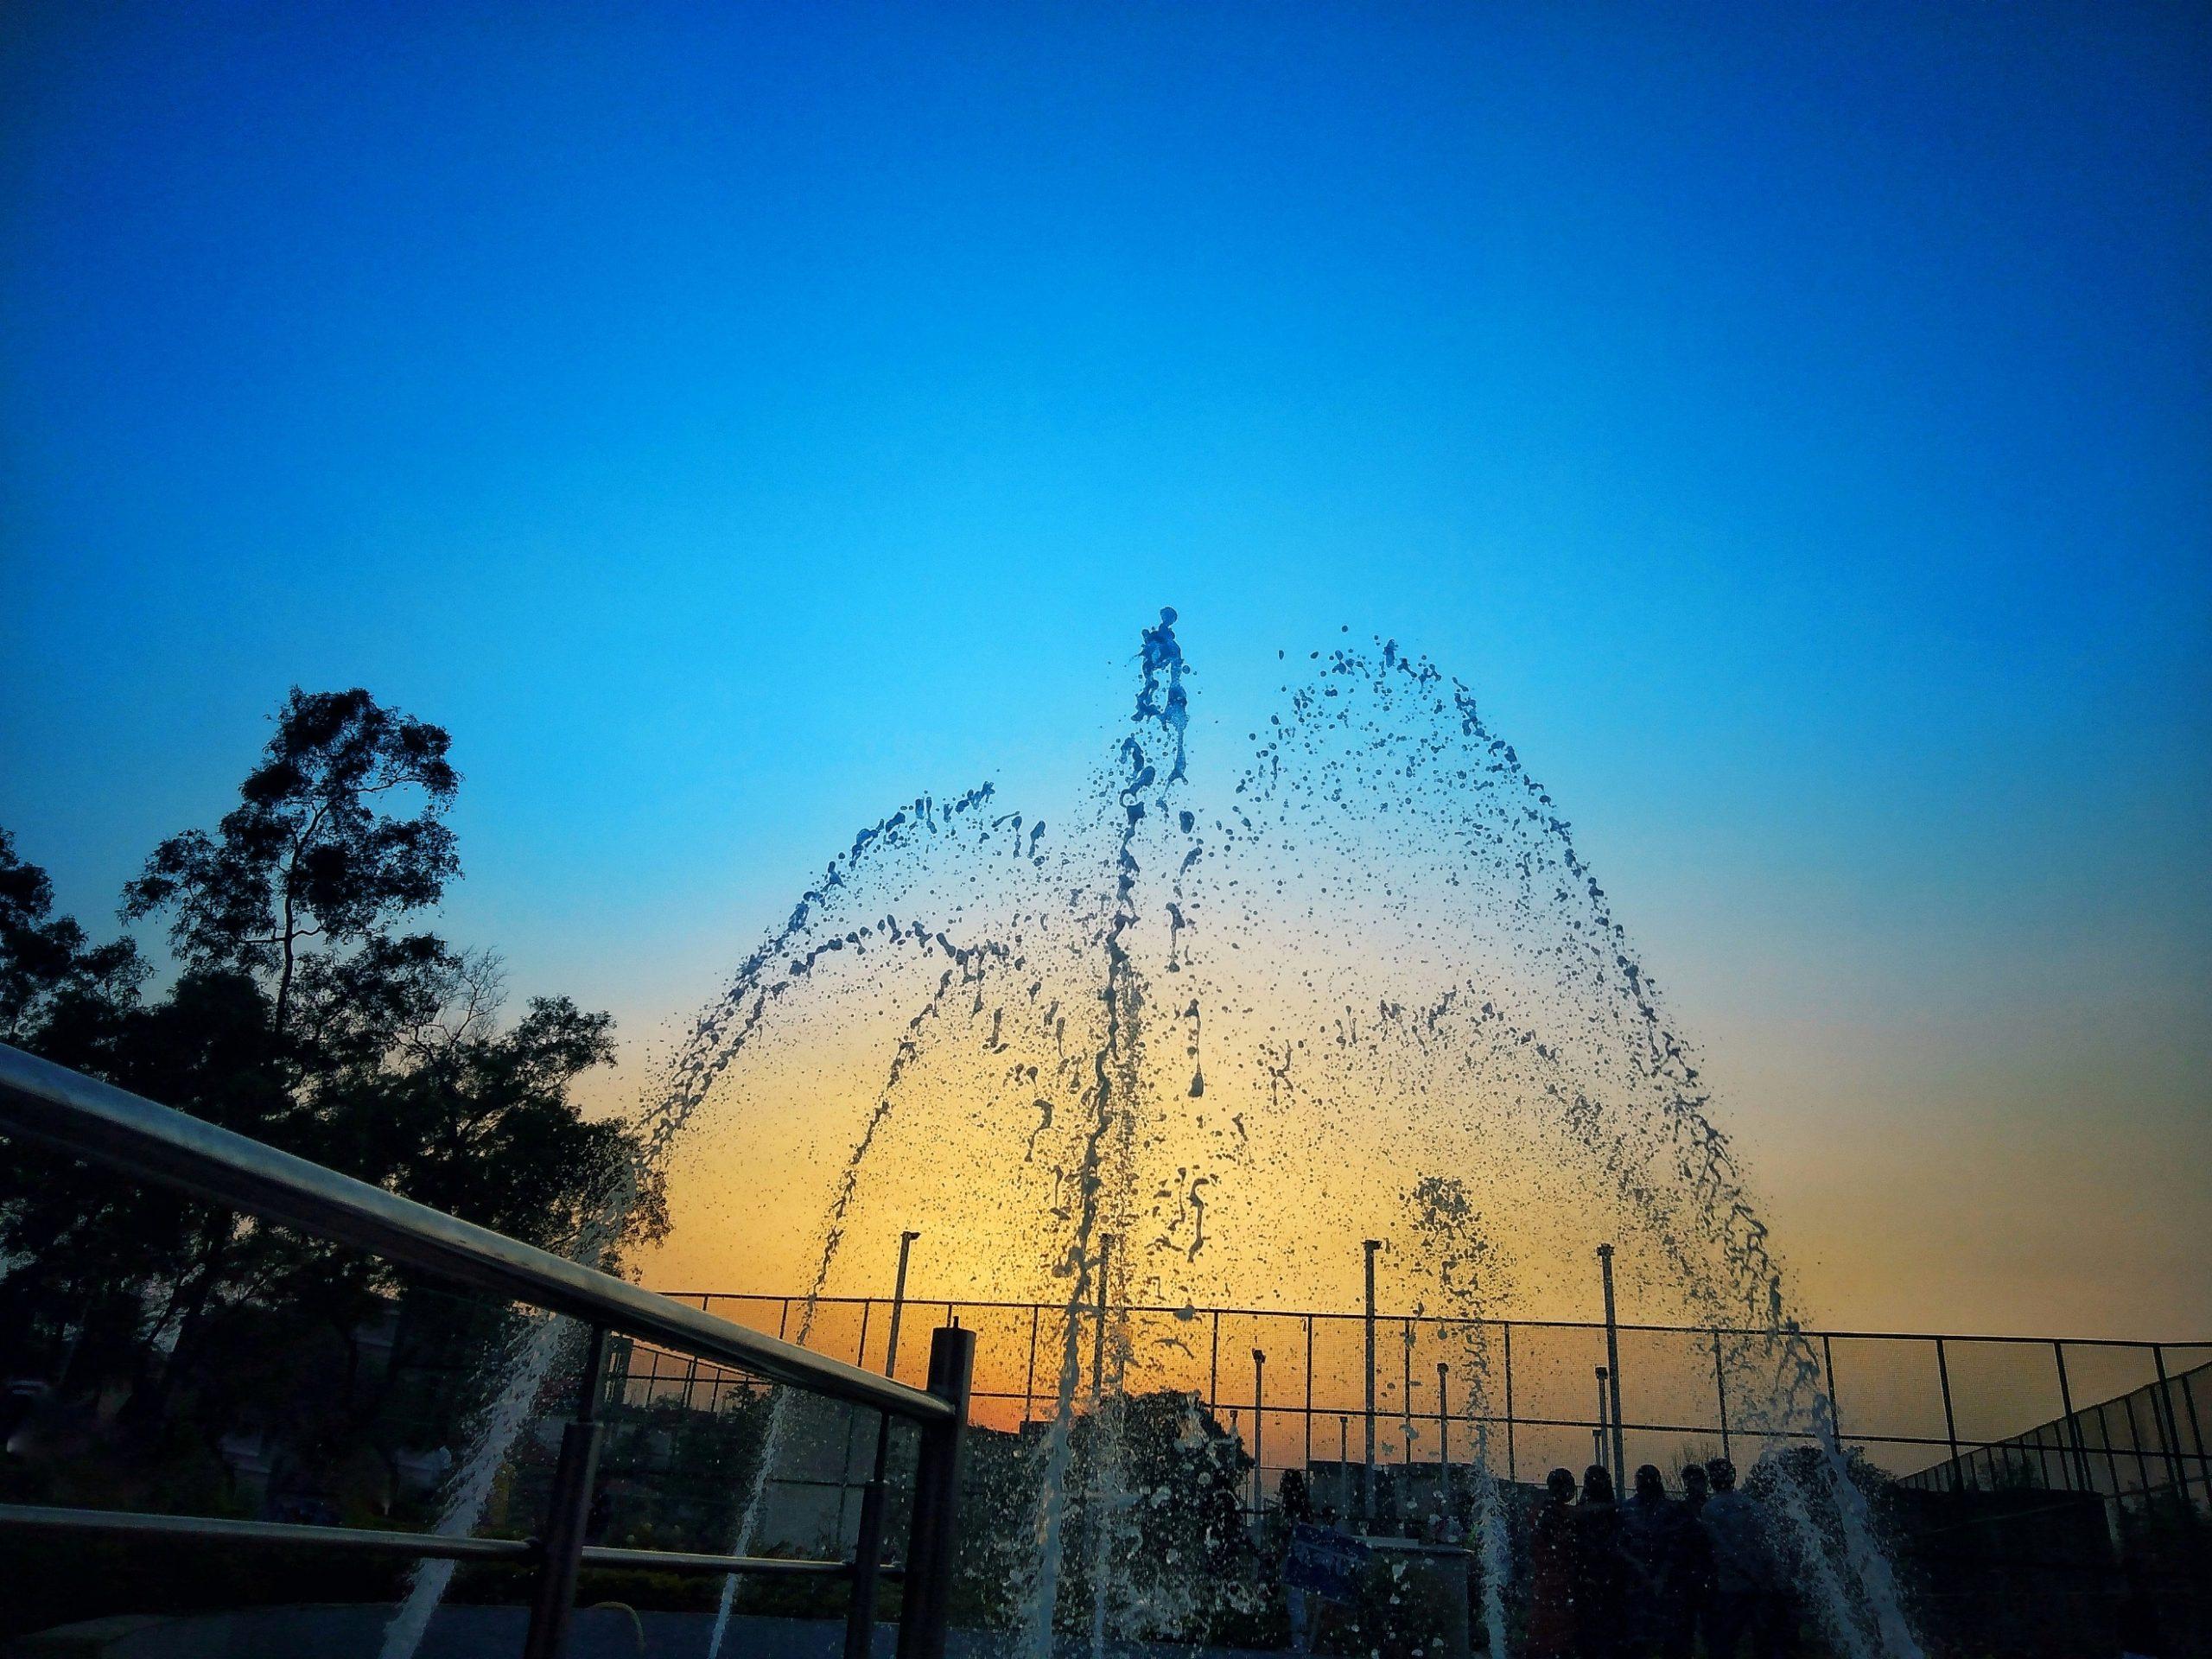 Fountain Water Splashing